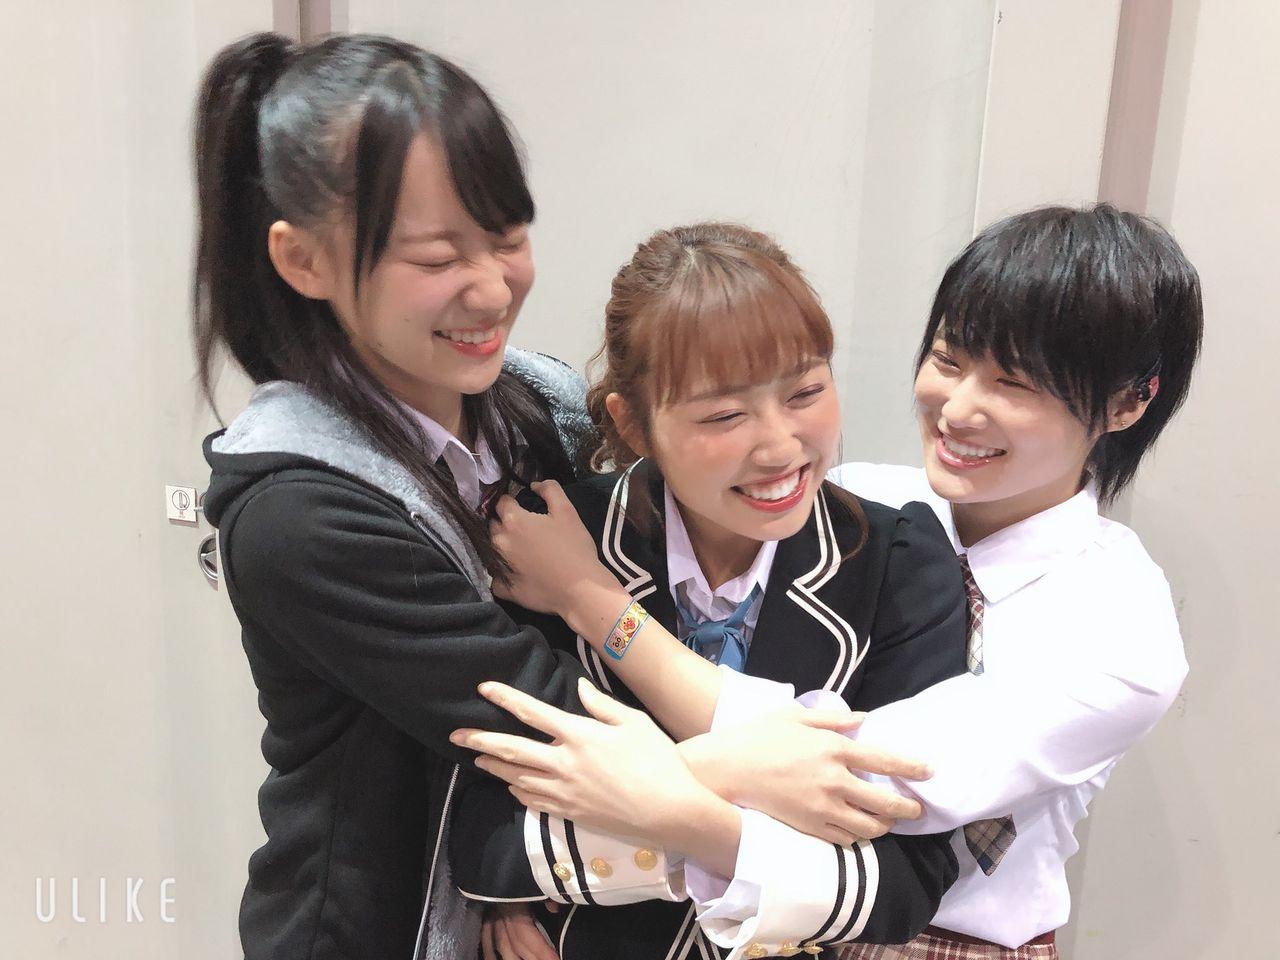 【NMB48】毎年恒例インフル注射キタジョ━━(゚∀゚)━━!!【城恵理子/大段結愛】